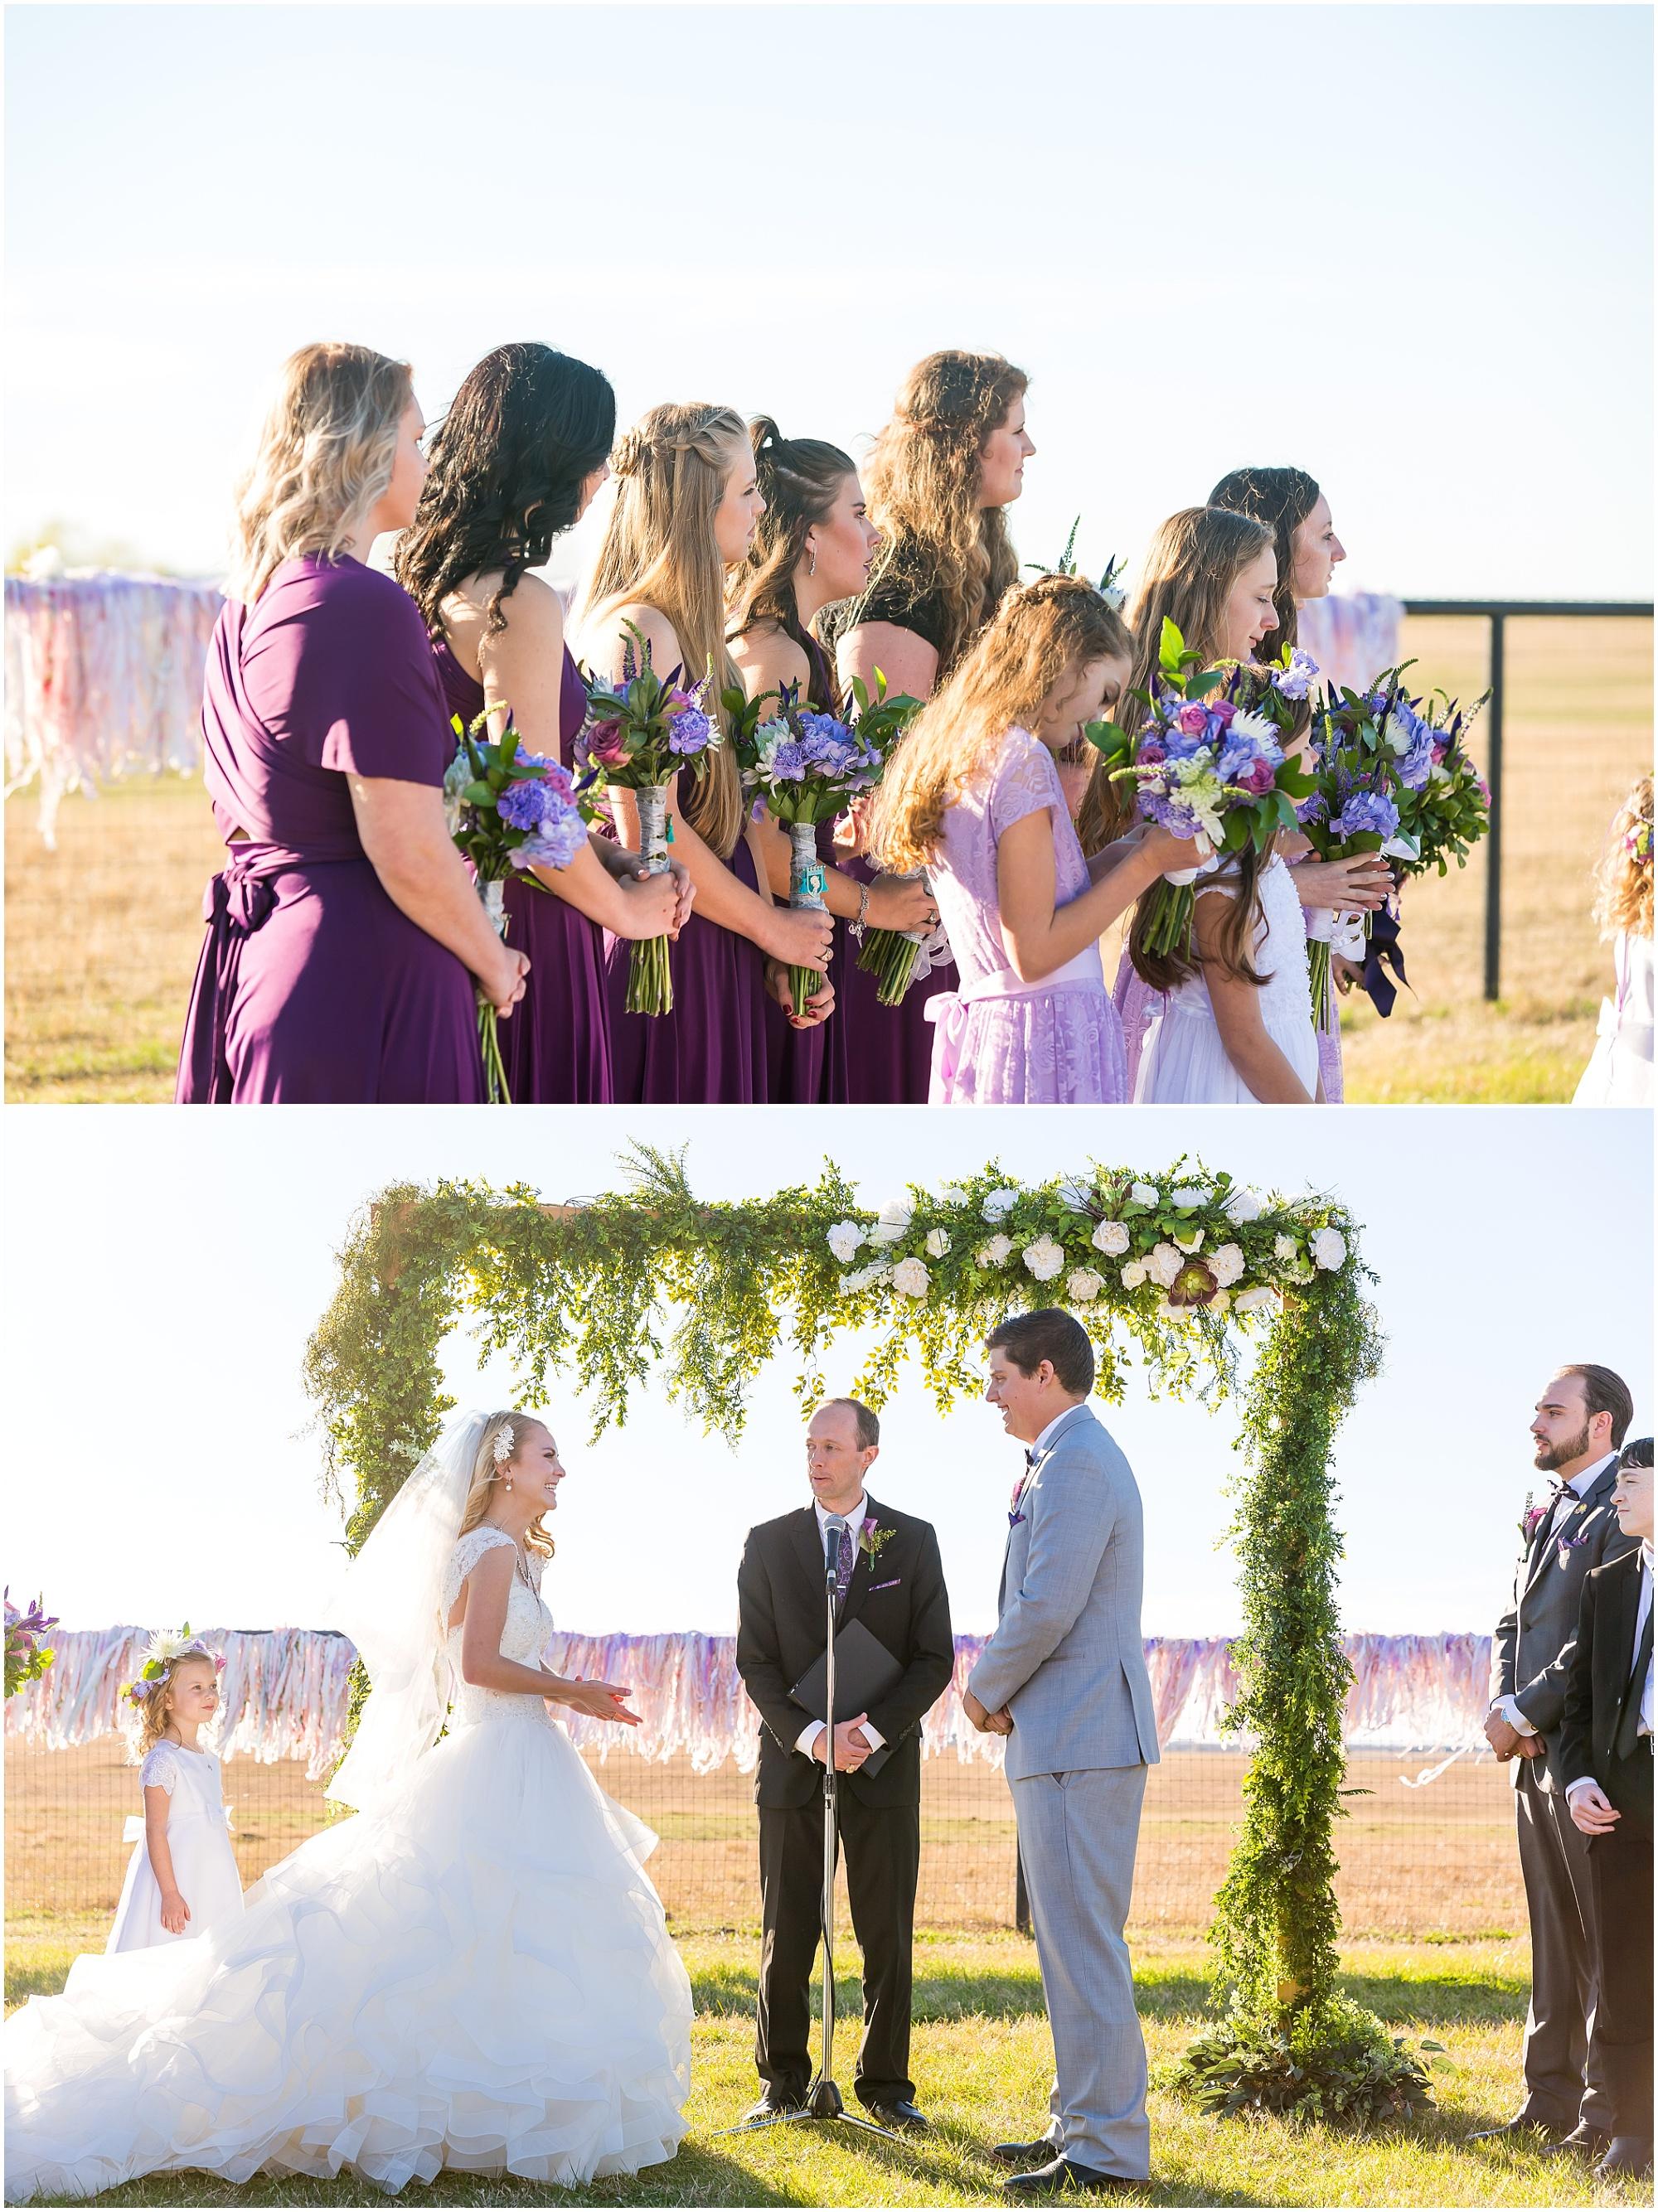 Disney-Inspired-Wedding-Central-Texas_0036.jpg